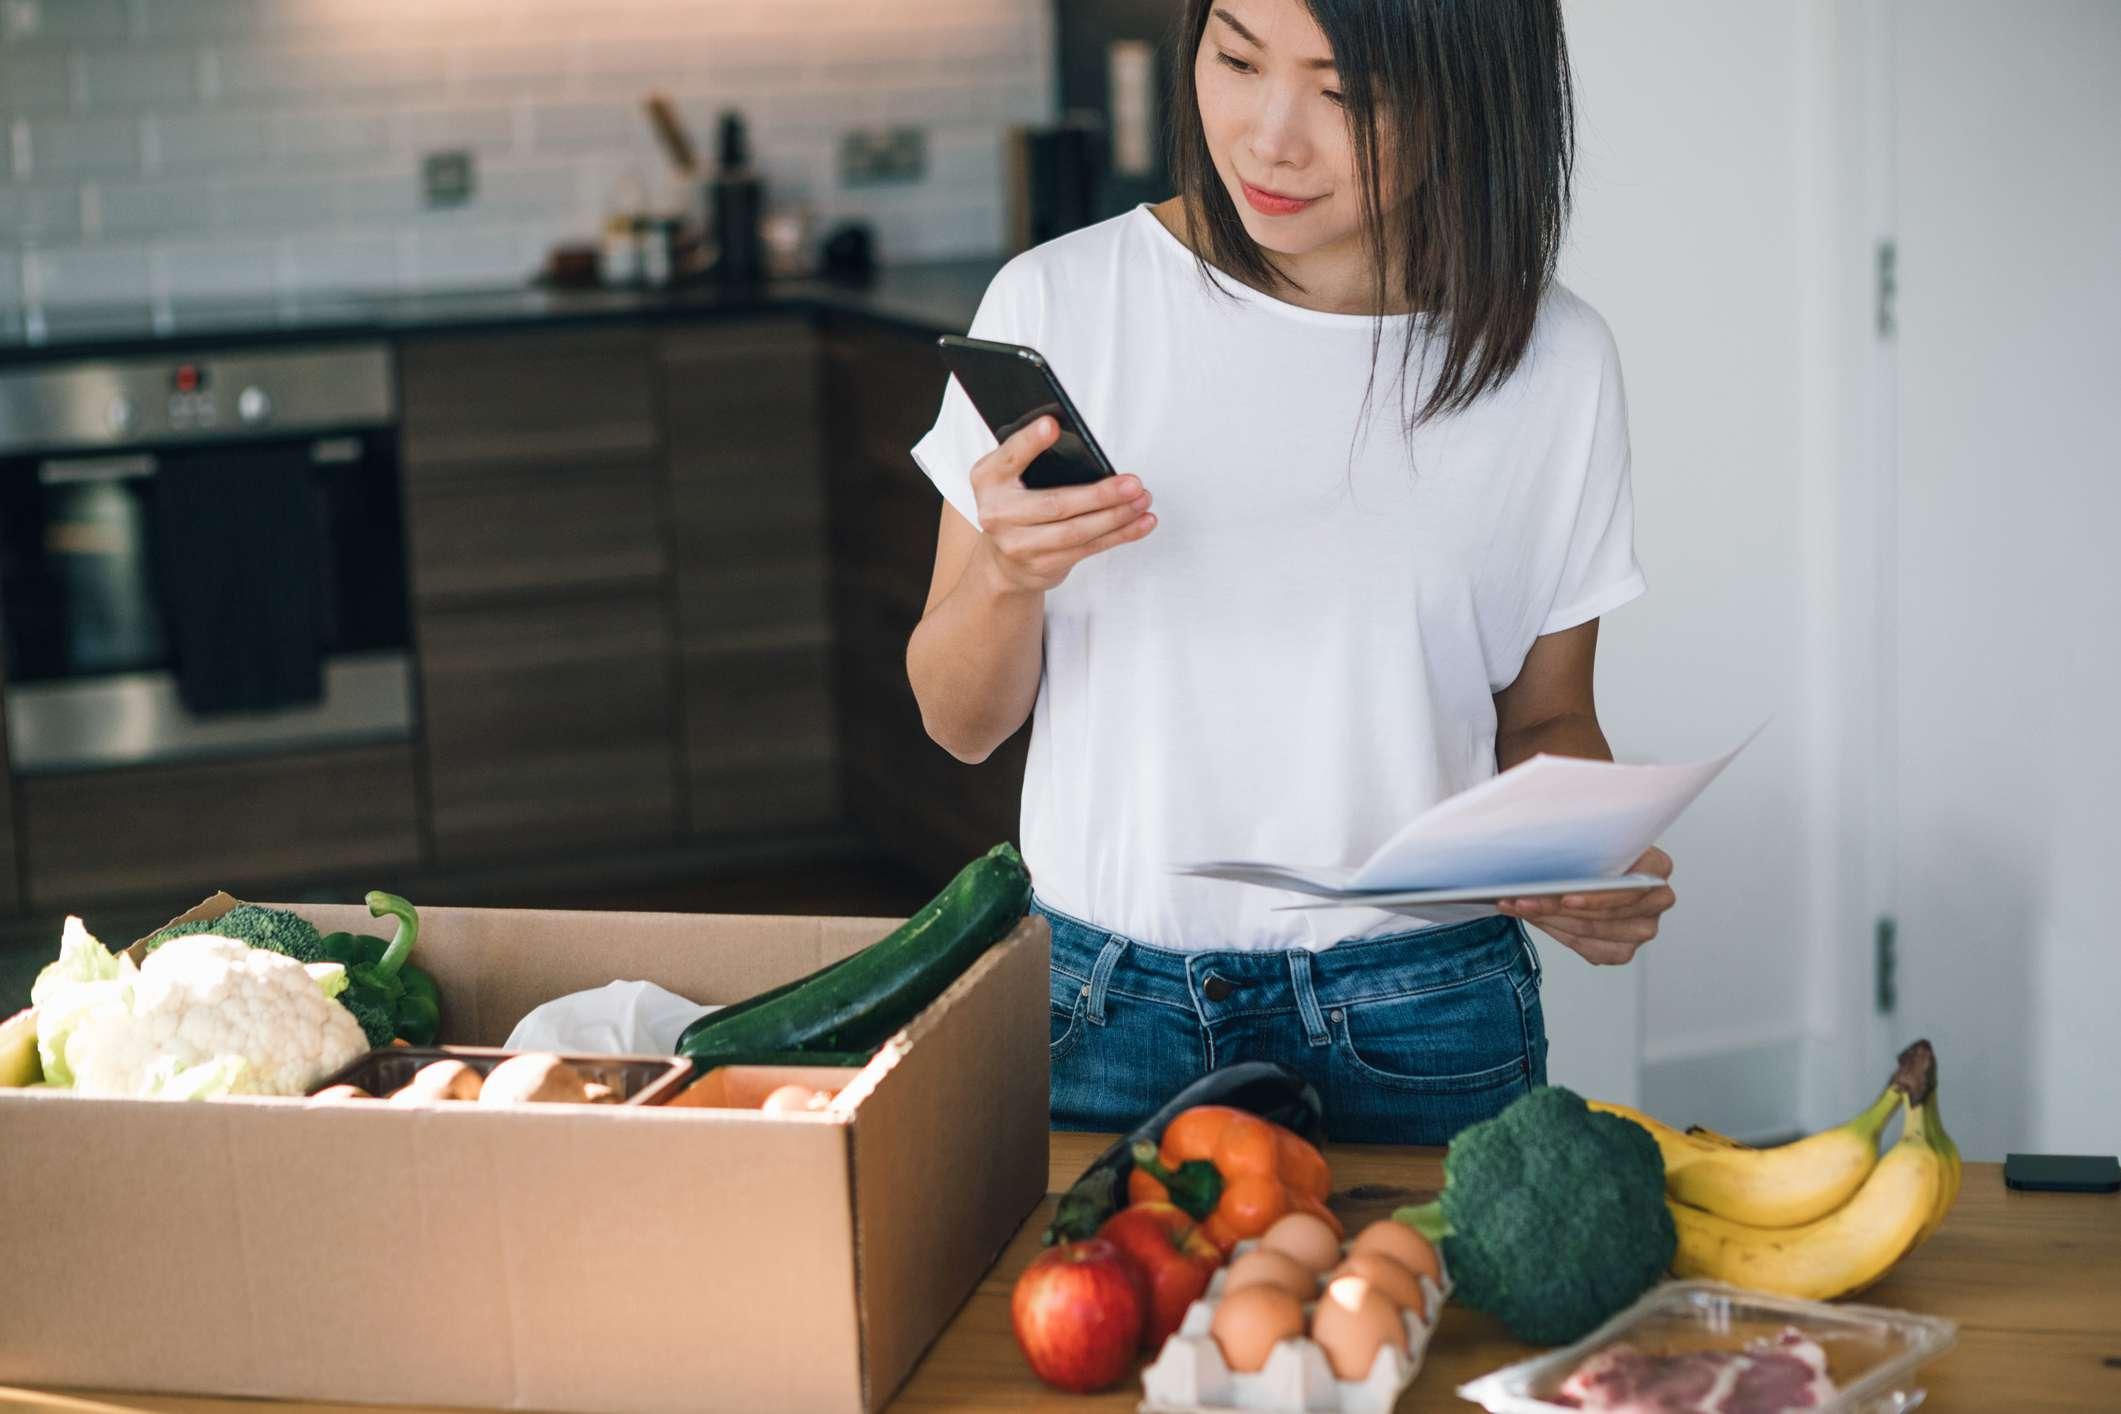 young woman checking food